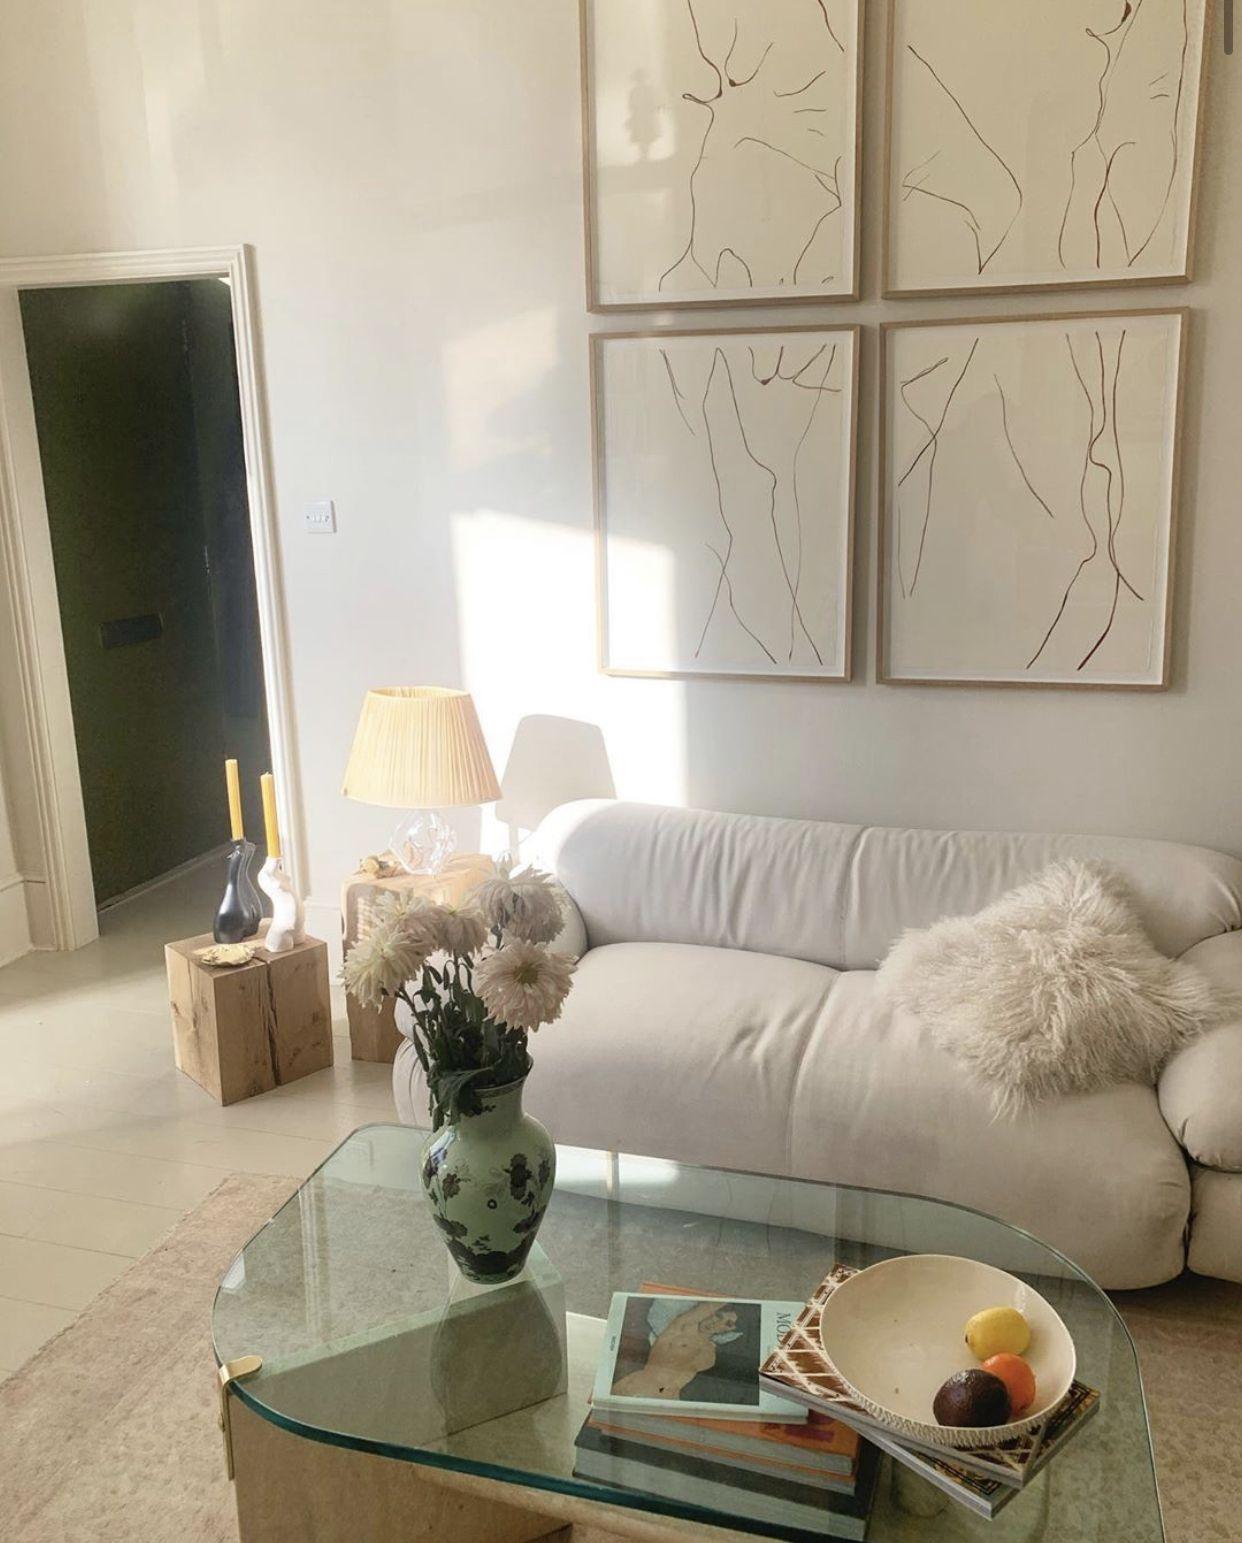 Pin By Esther Titselaar On Studio Ideas Home Decor House